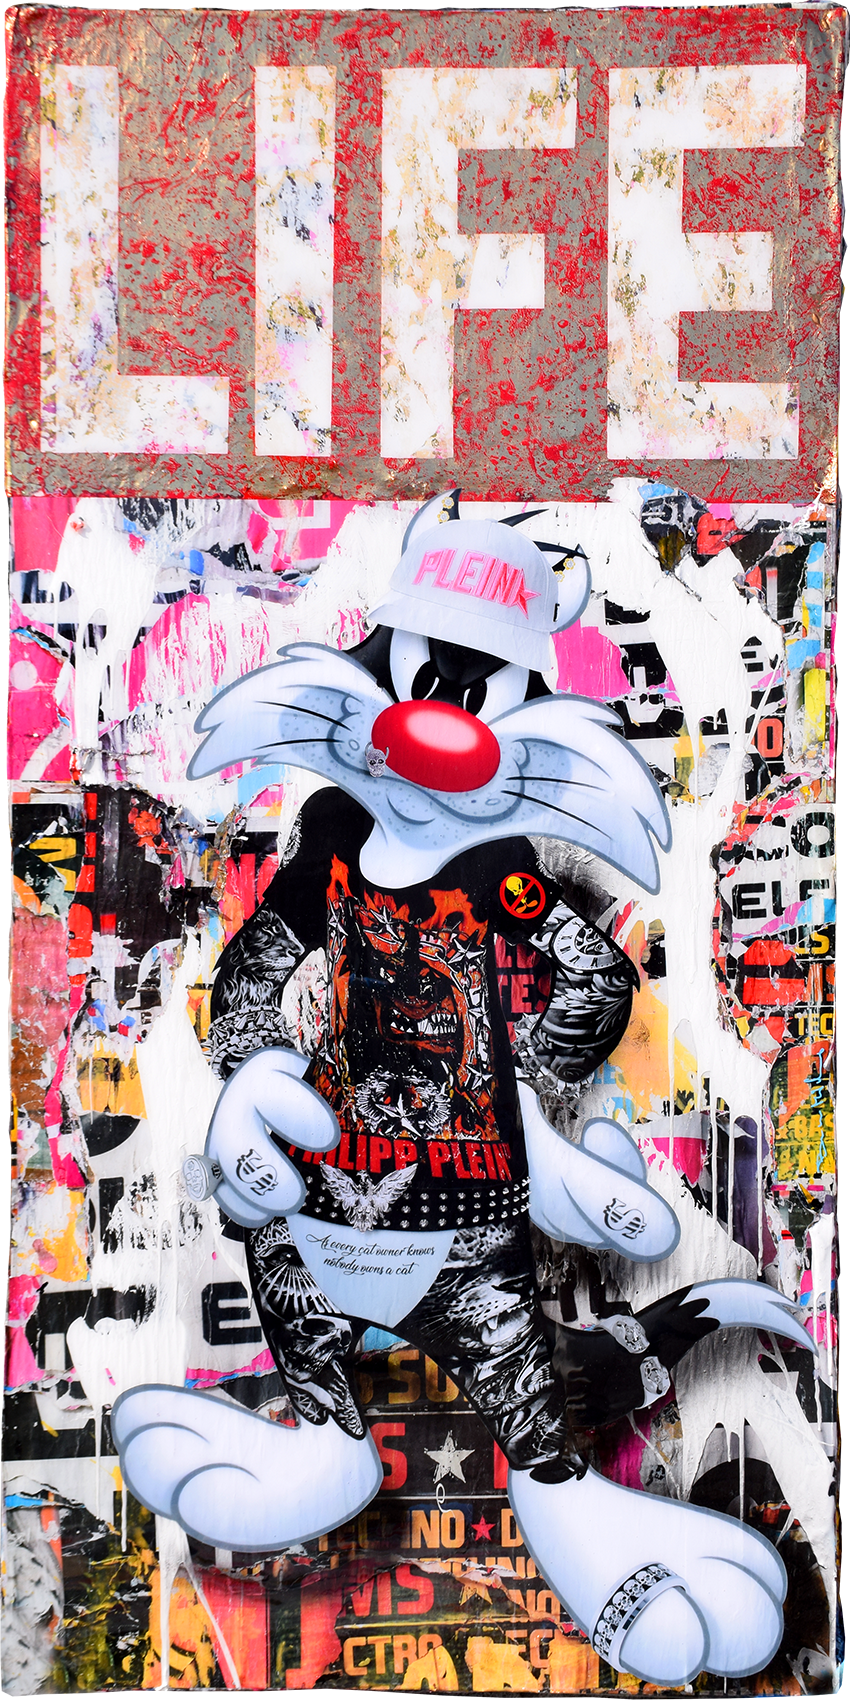 Bram Reijnders - Sylvester (LIFE) , 8031-012-083